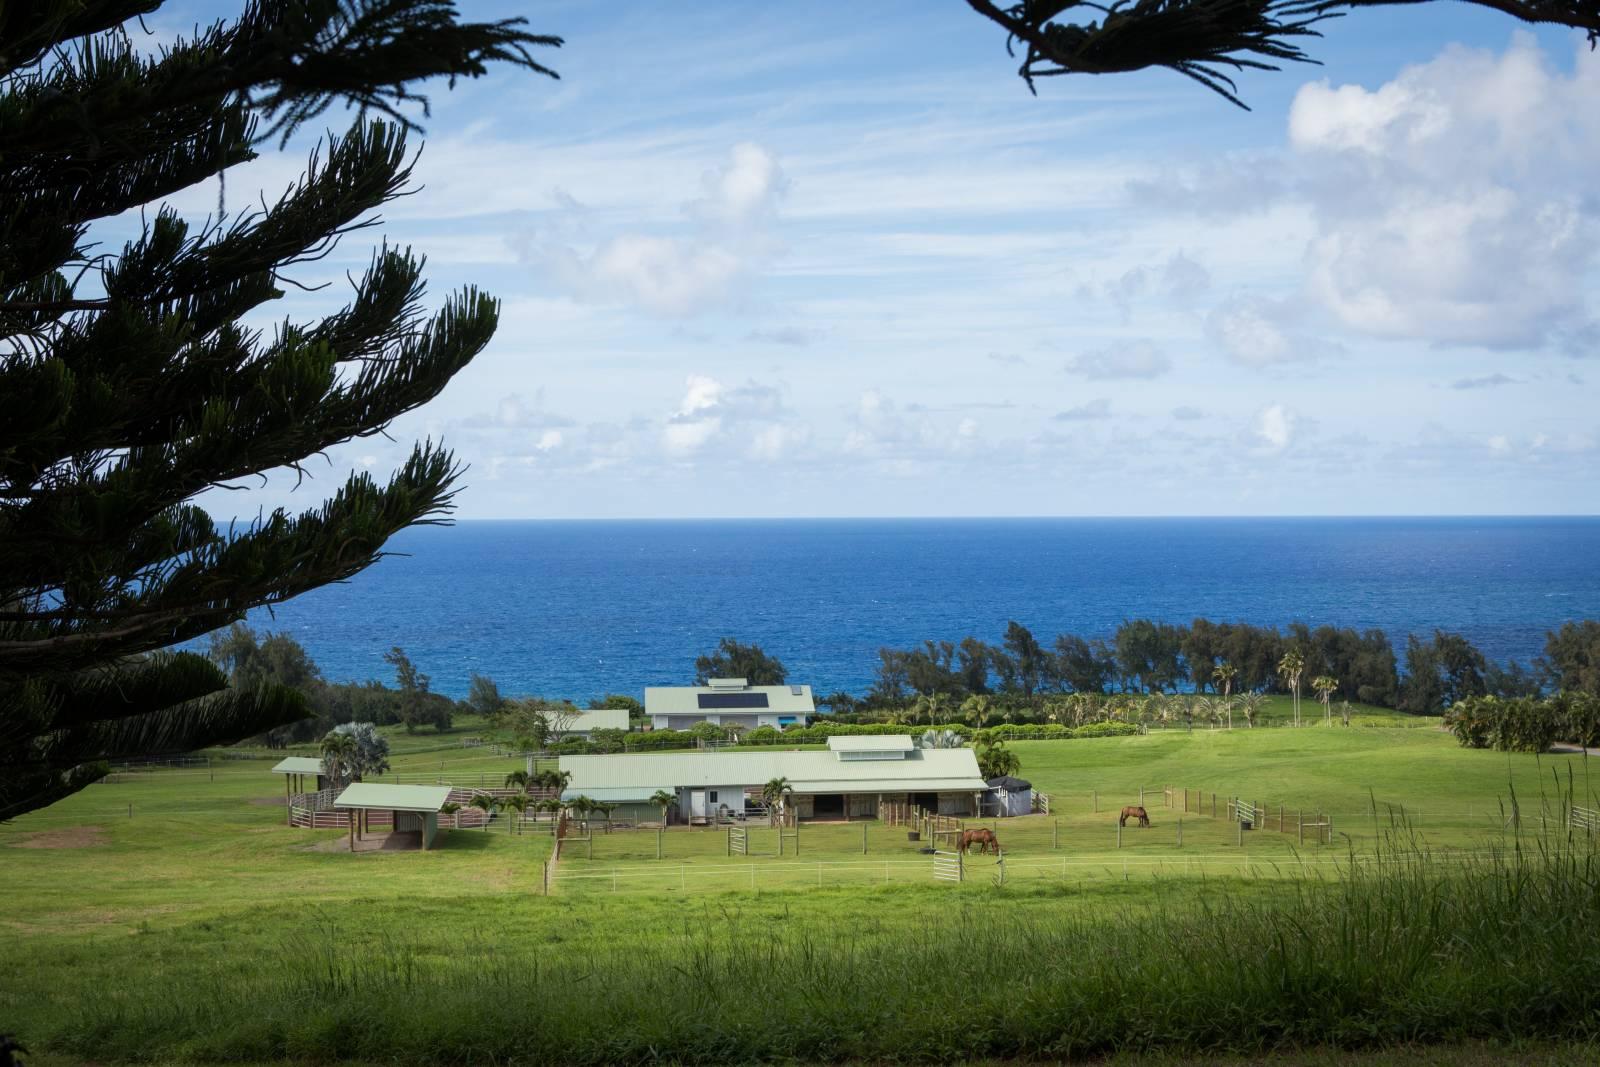 Ocean and equestrian facilities